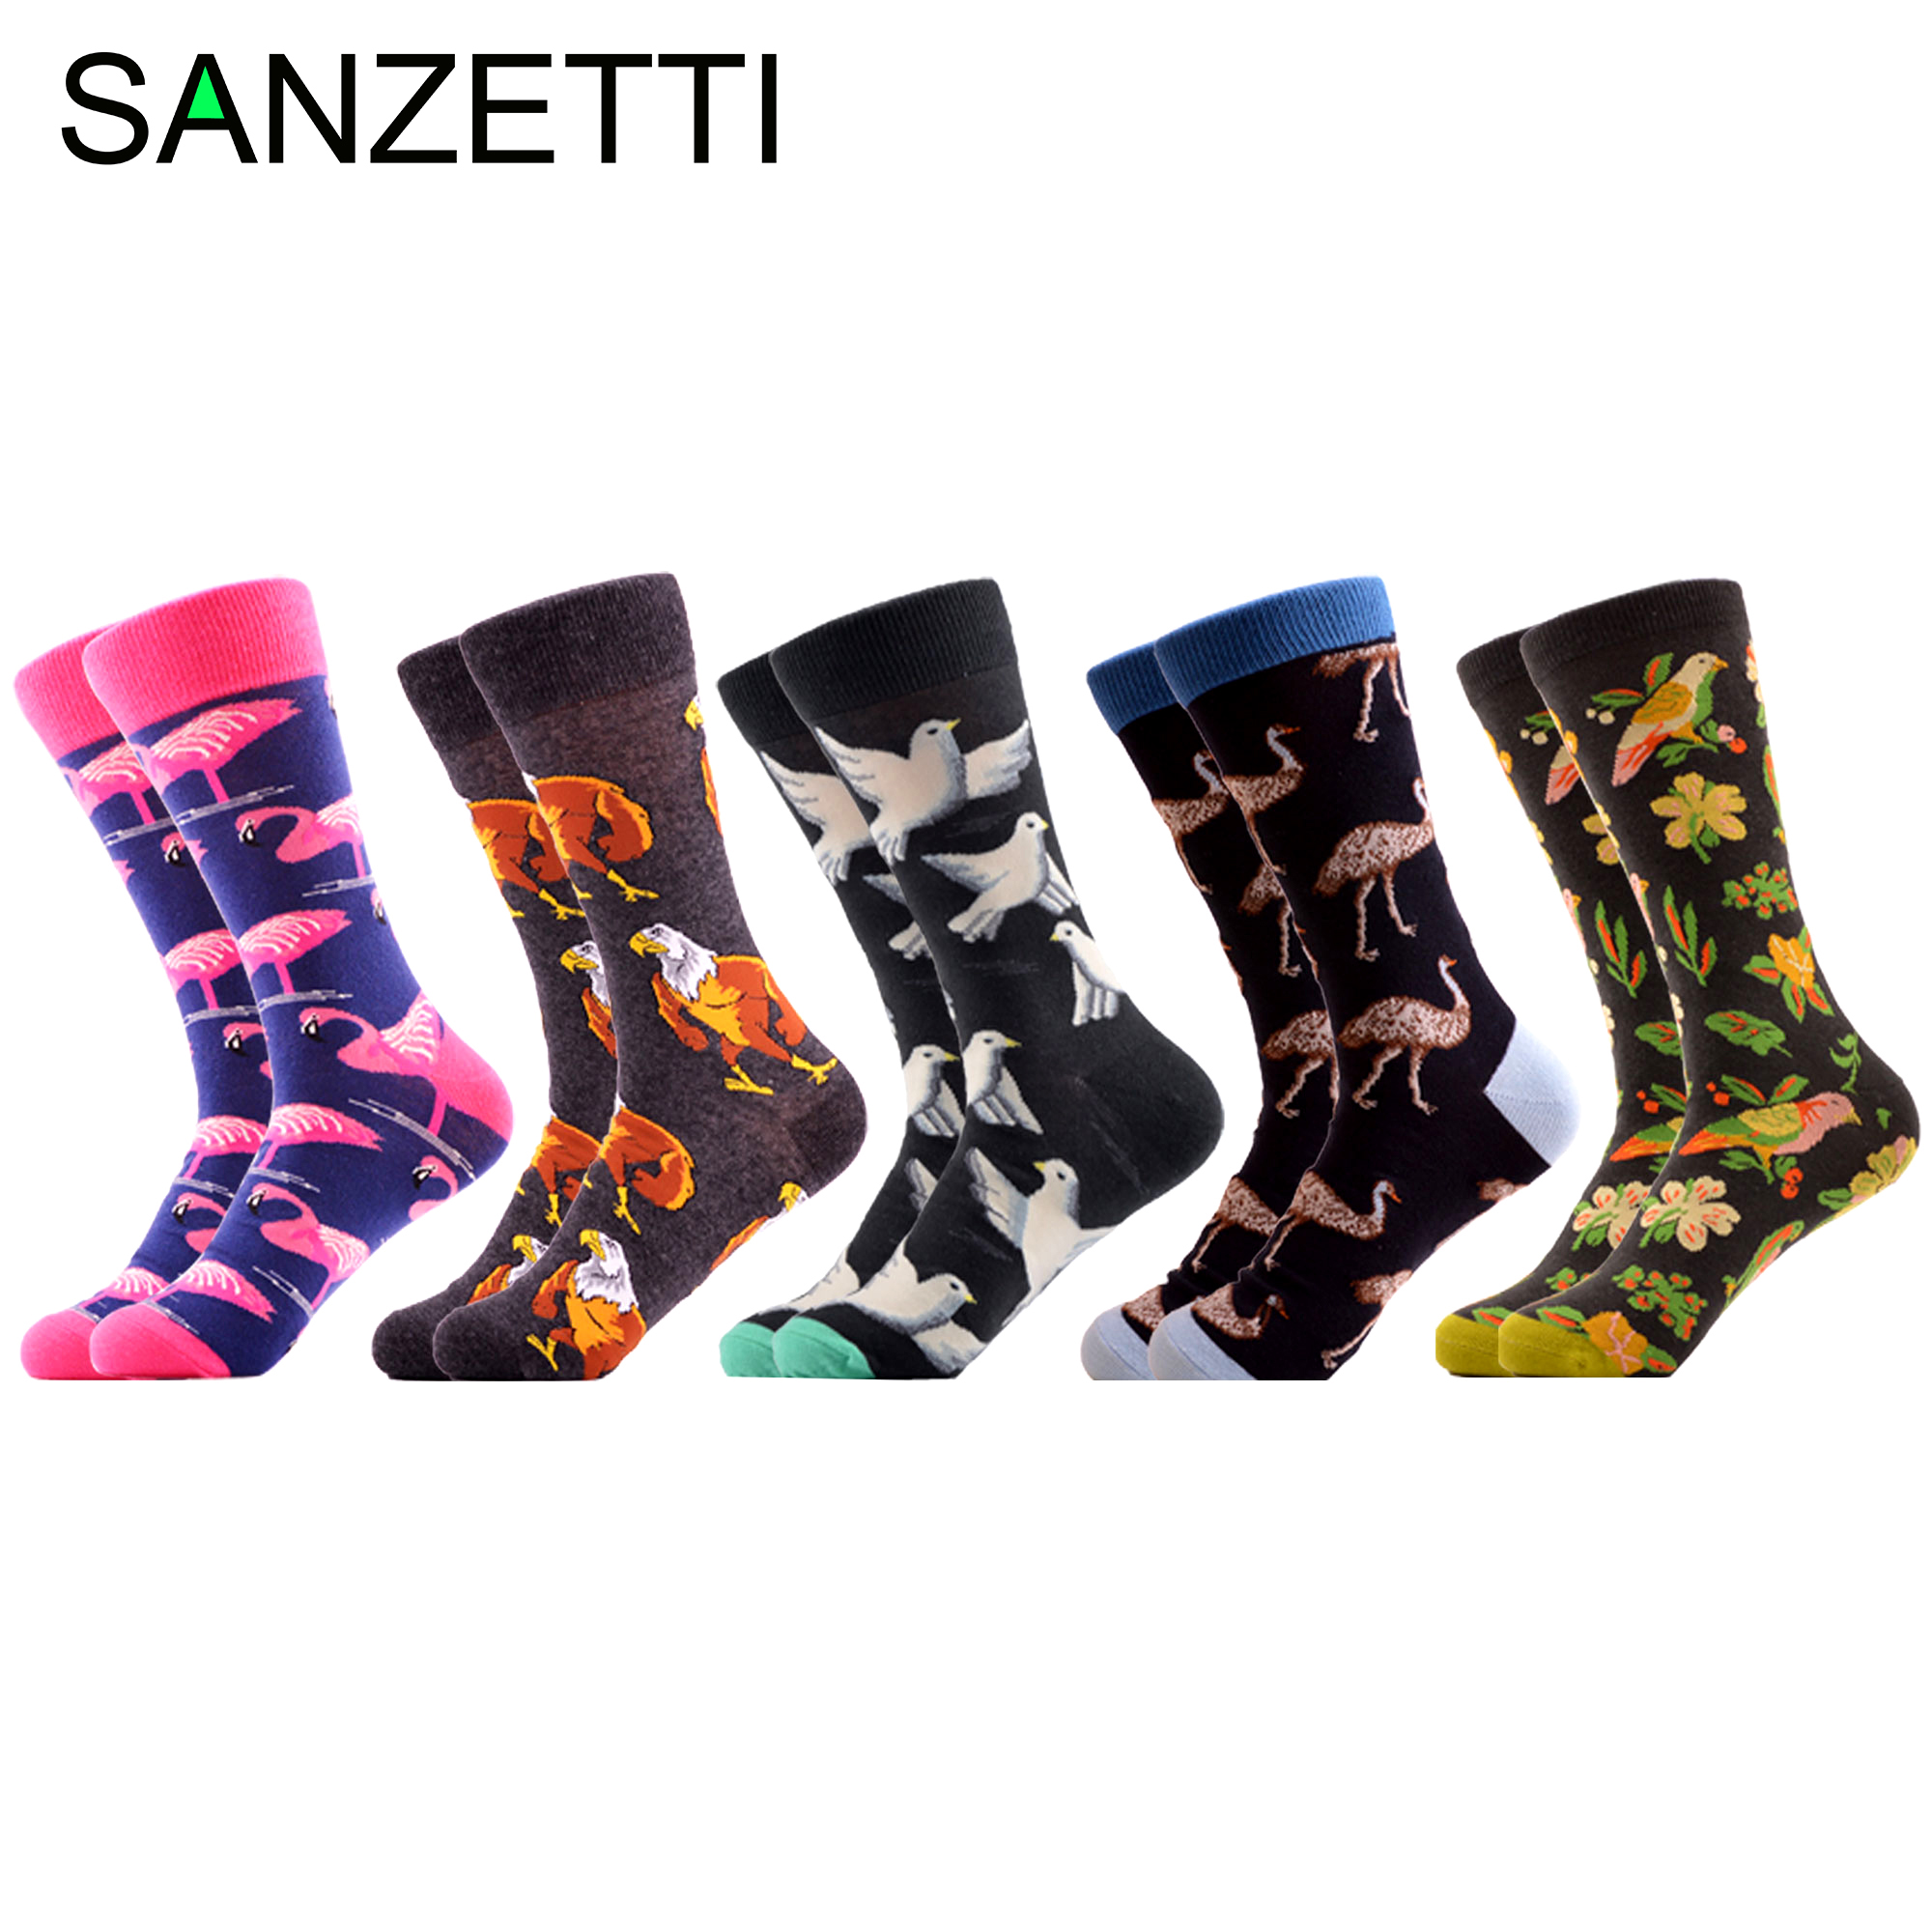 SANZETTI 5 Pairs/Lot 2020 New Happy Men's Causal Socks Bright Colorful Pattern Bird Funny Novelty Dress Socks Gift Wedding Socks